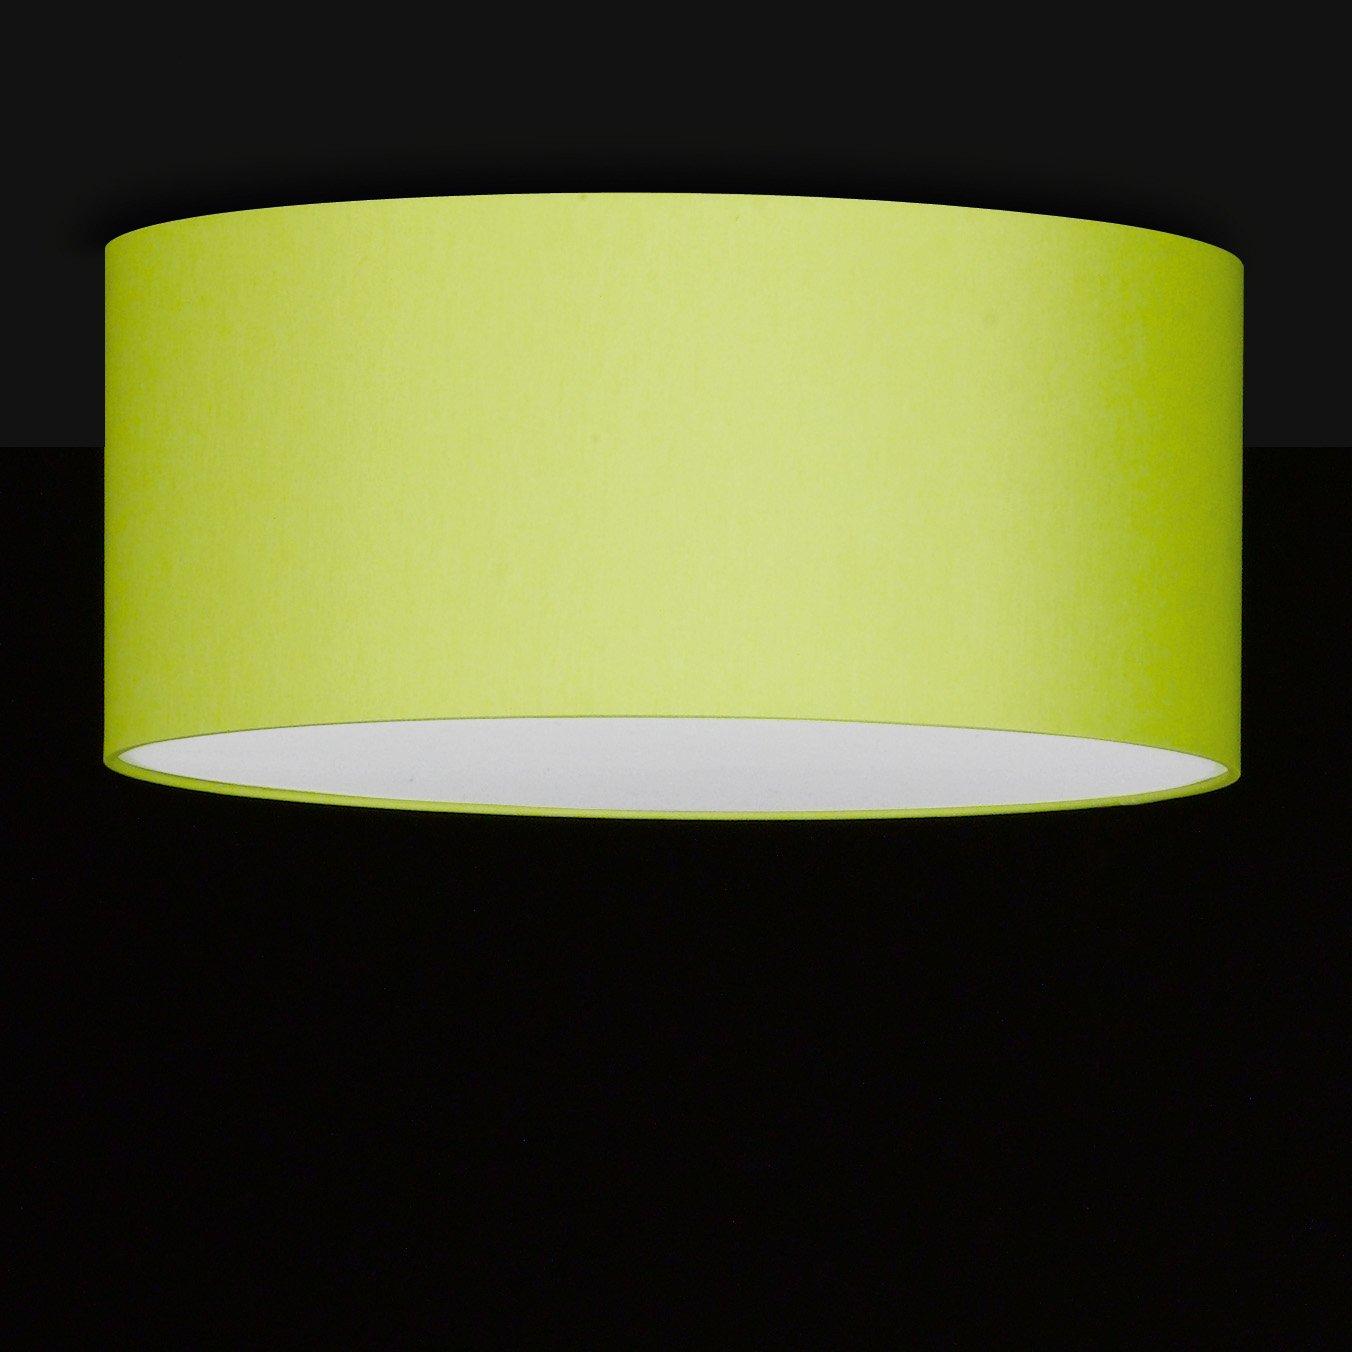 unique deckenleuchte verkabelung farben images der schaltplan. Black Bedroom Furniture Sets. Home Design Ideas